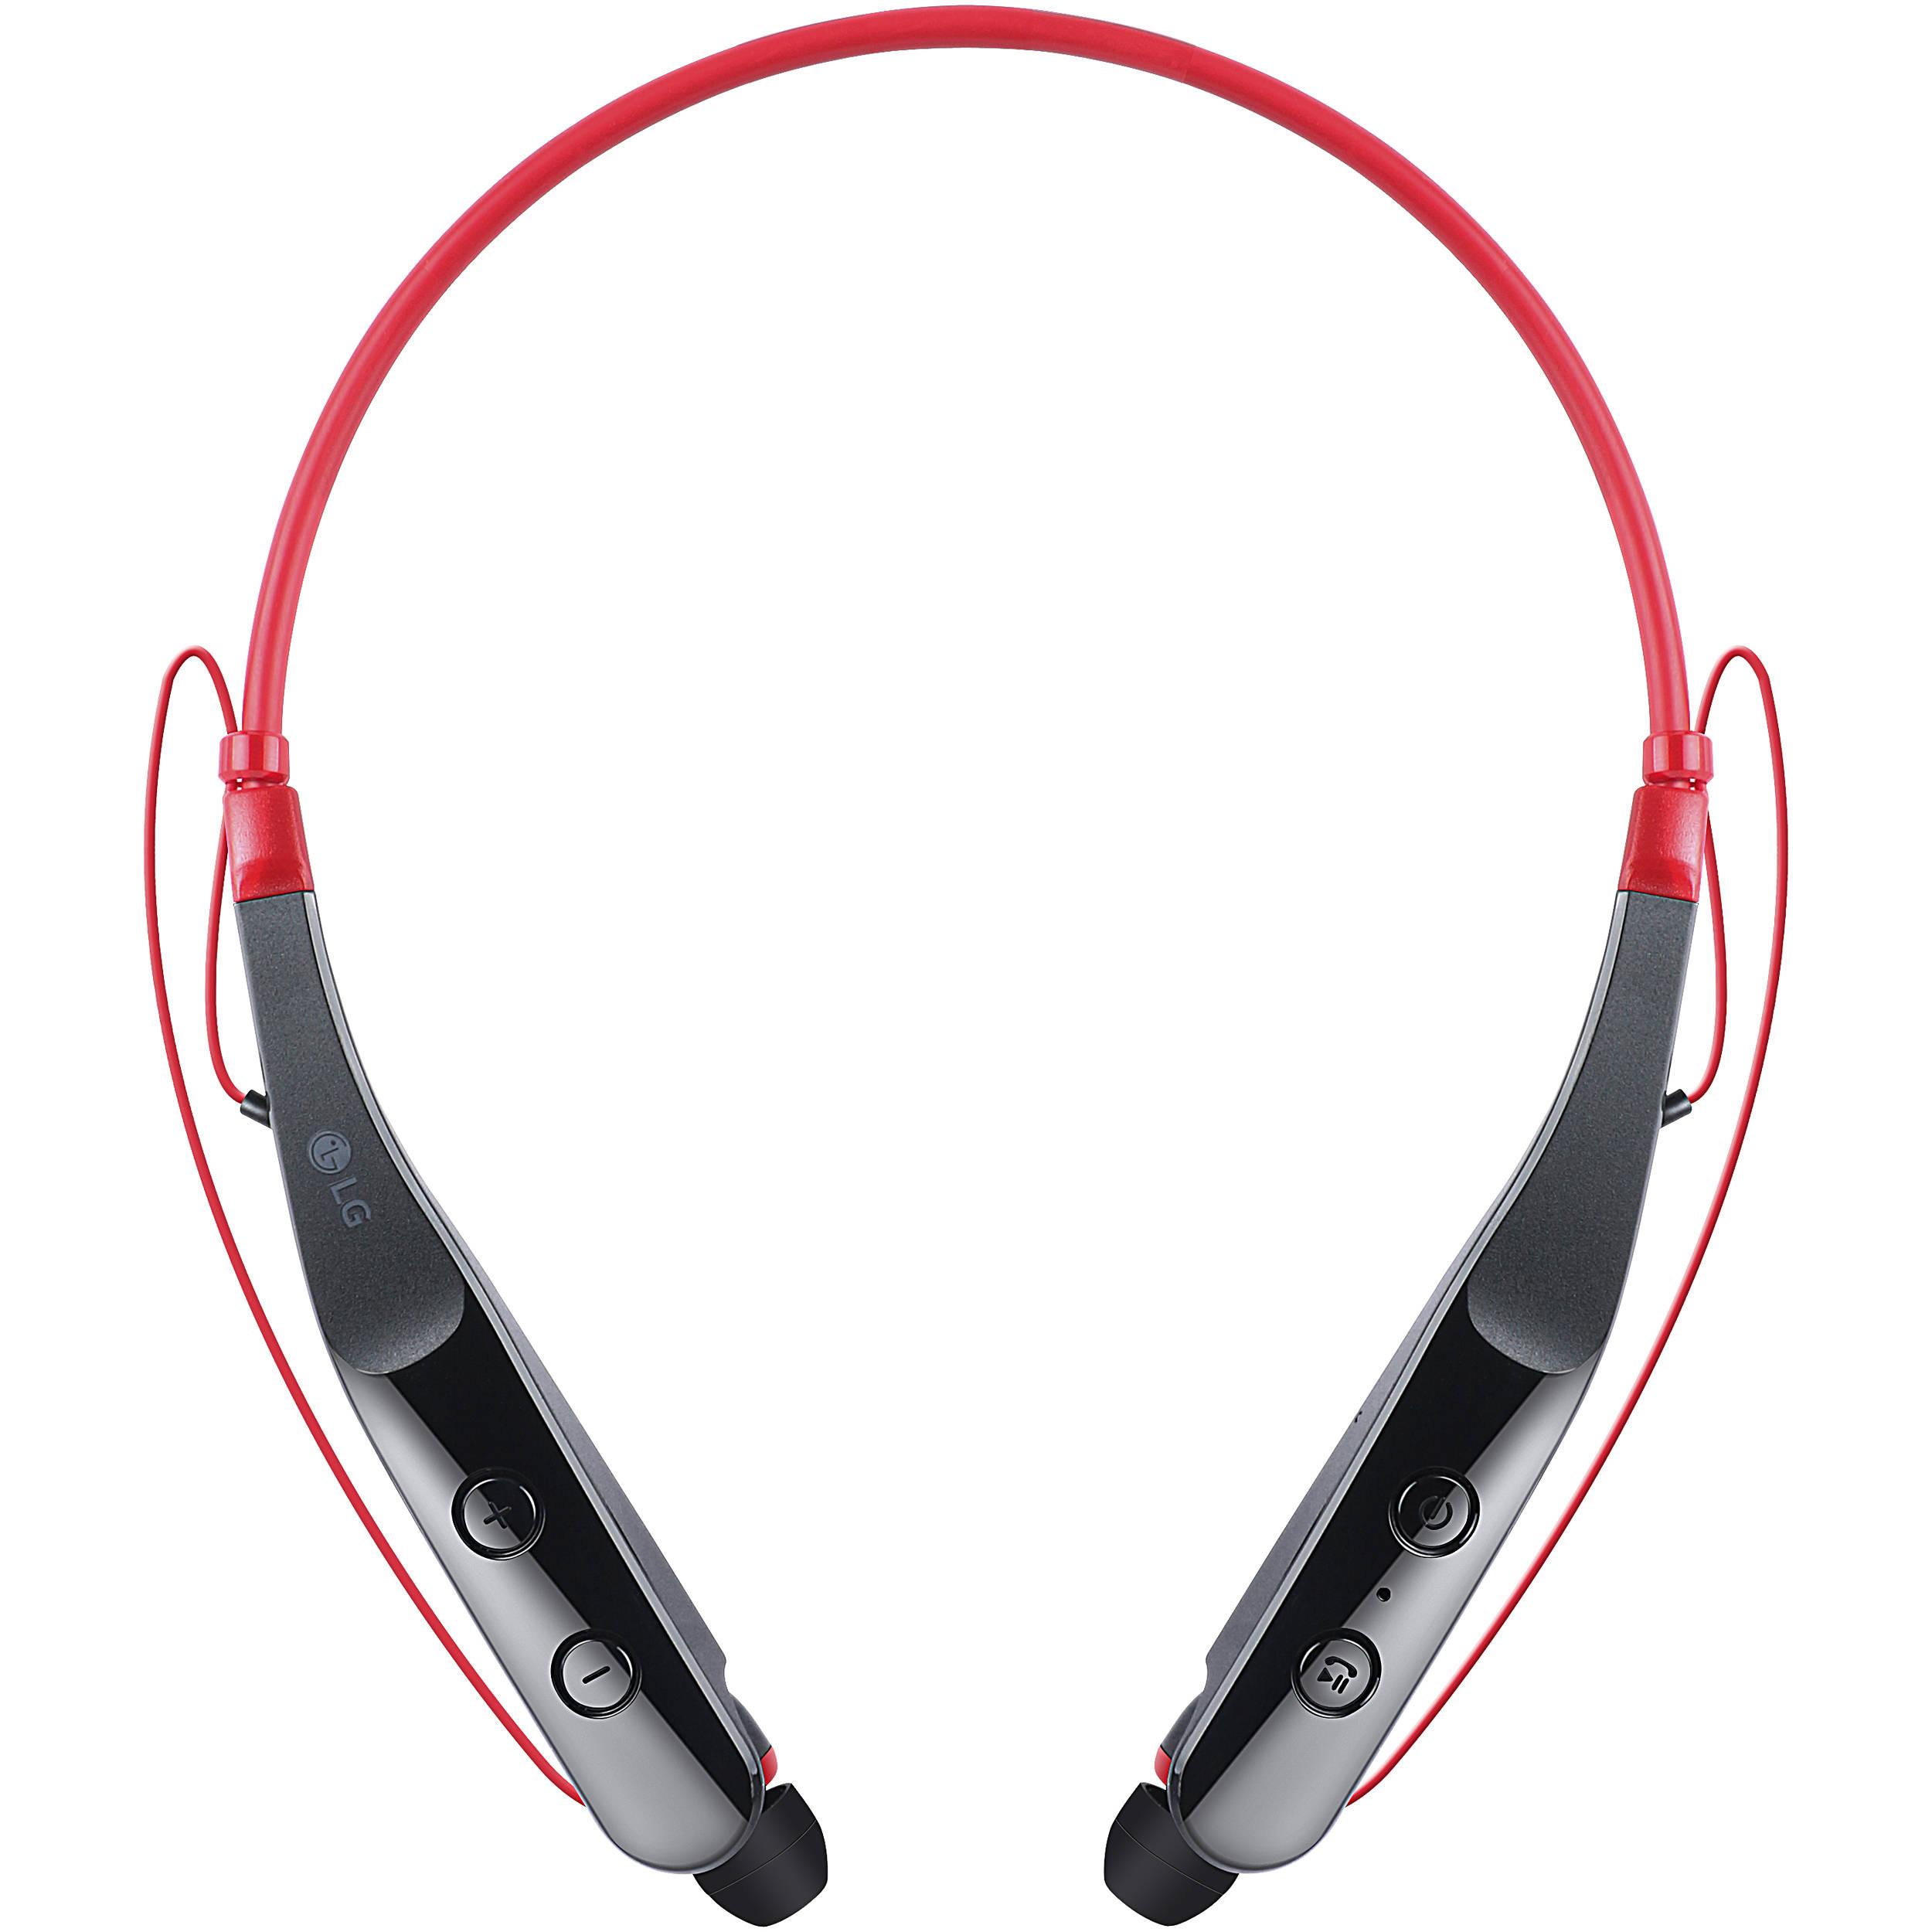 cc2266bc07d LG Tone Triumph Bluetooth Wireless Stereo Headset